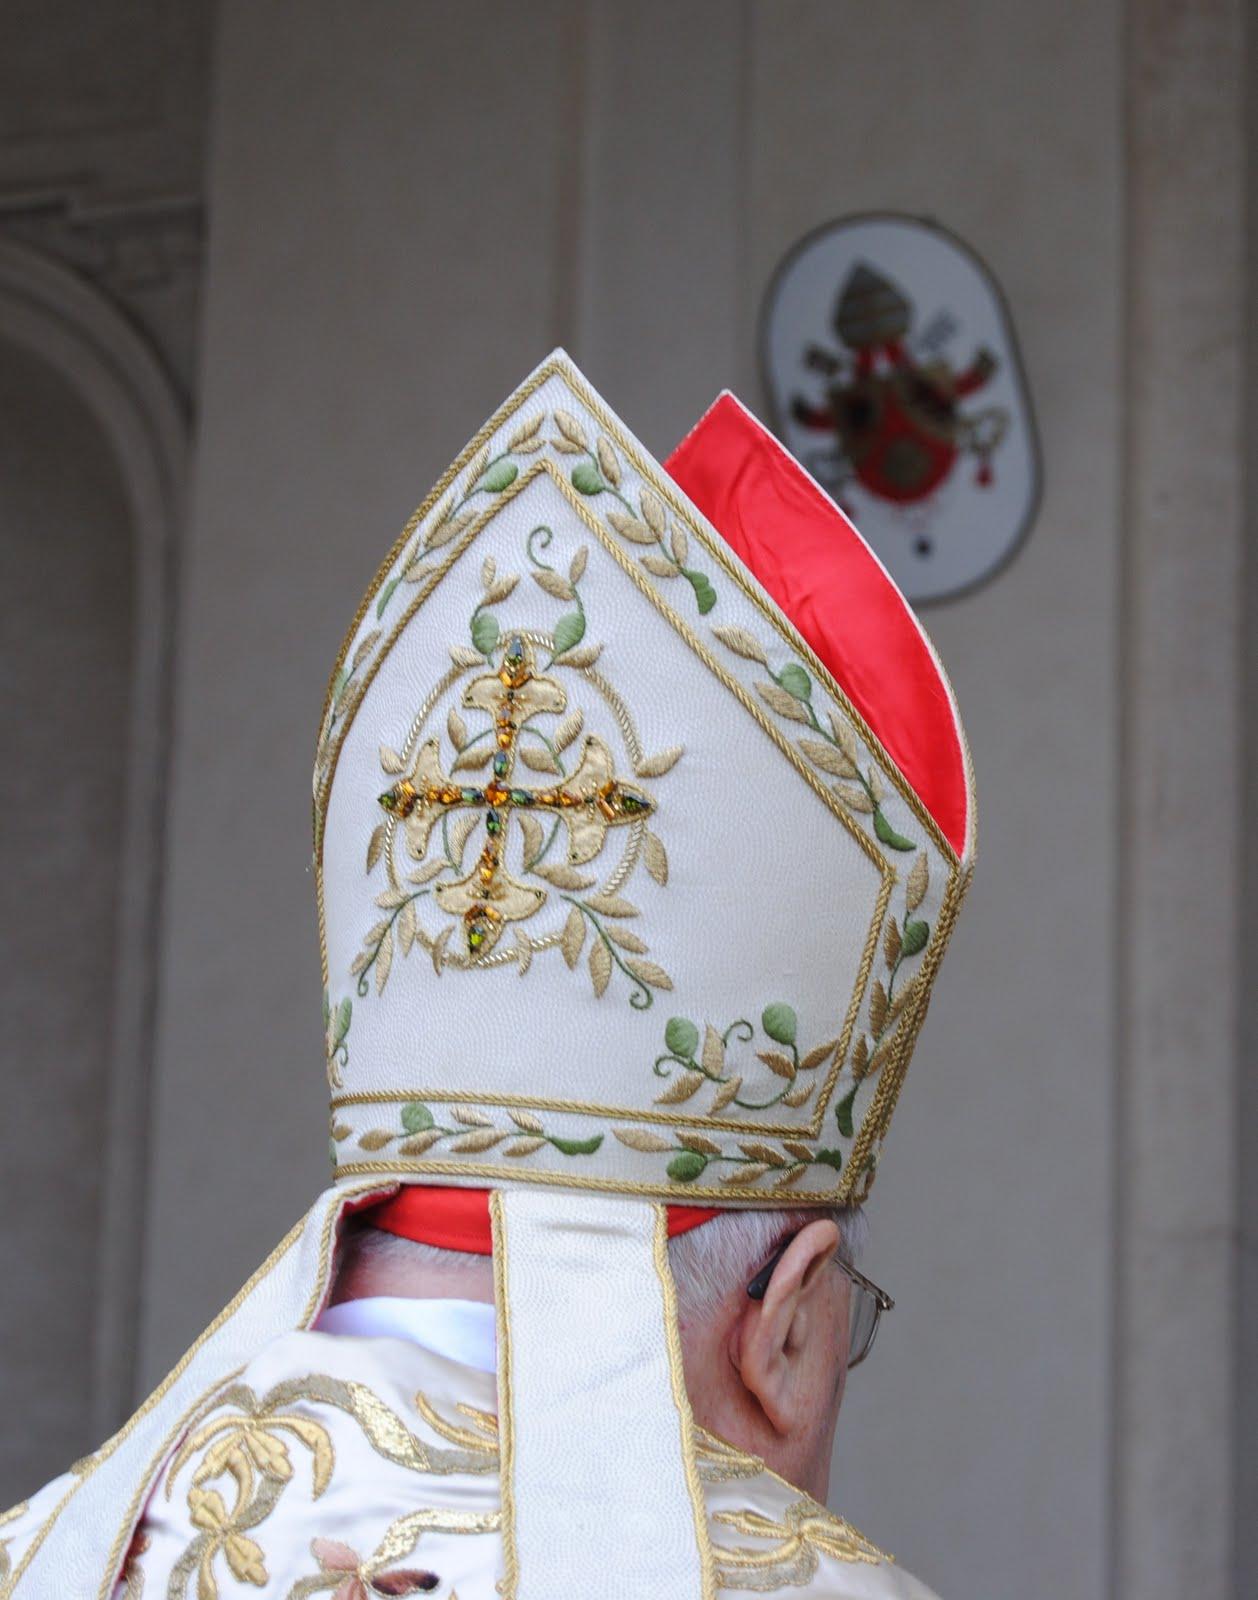 Orbis Catholicus Secundus Papal Arms With Mitre Or Tiara